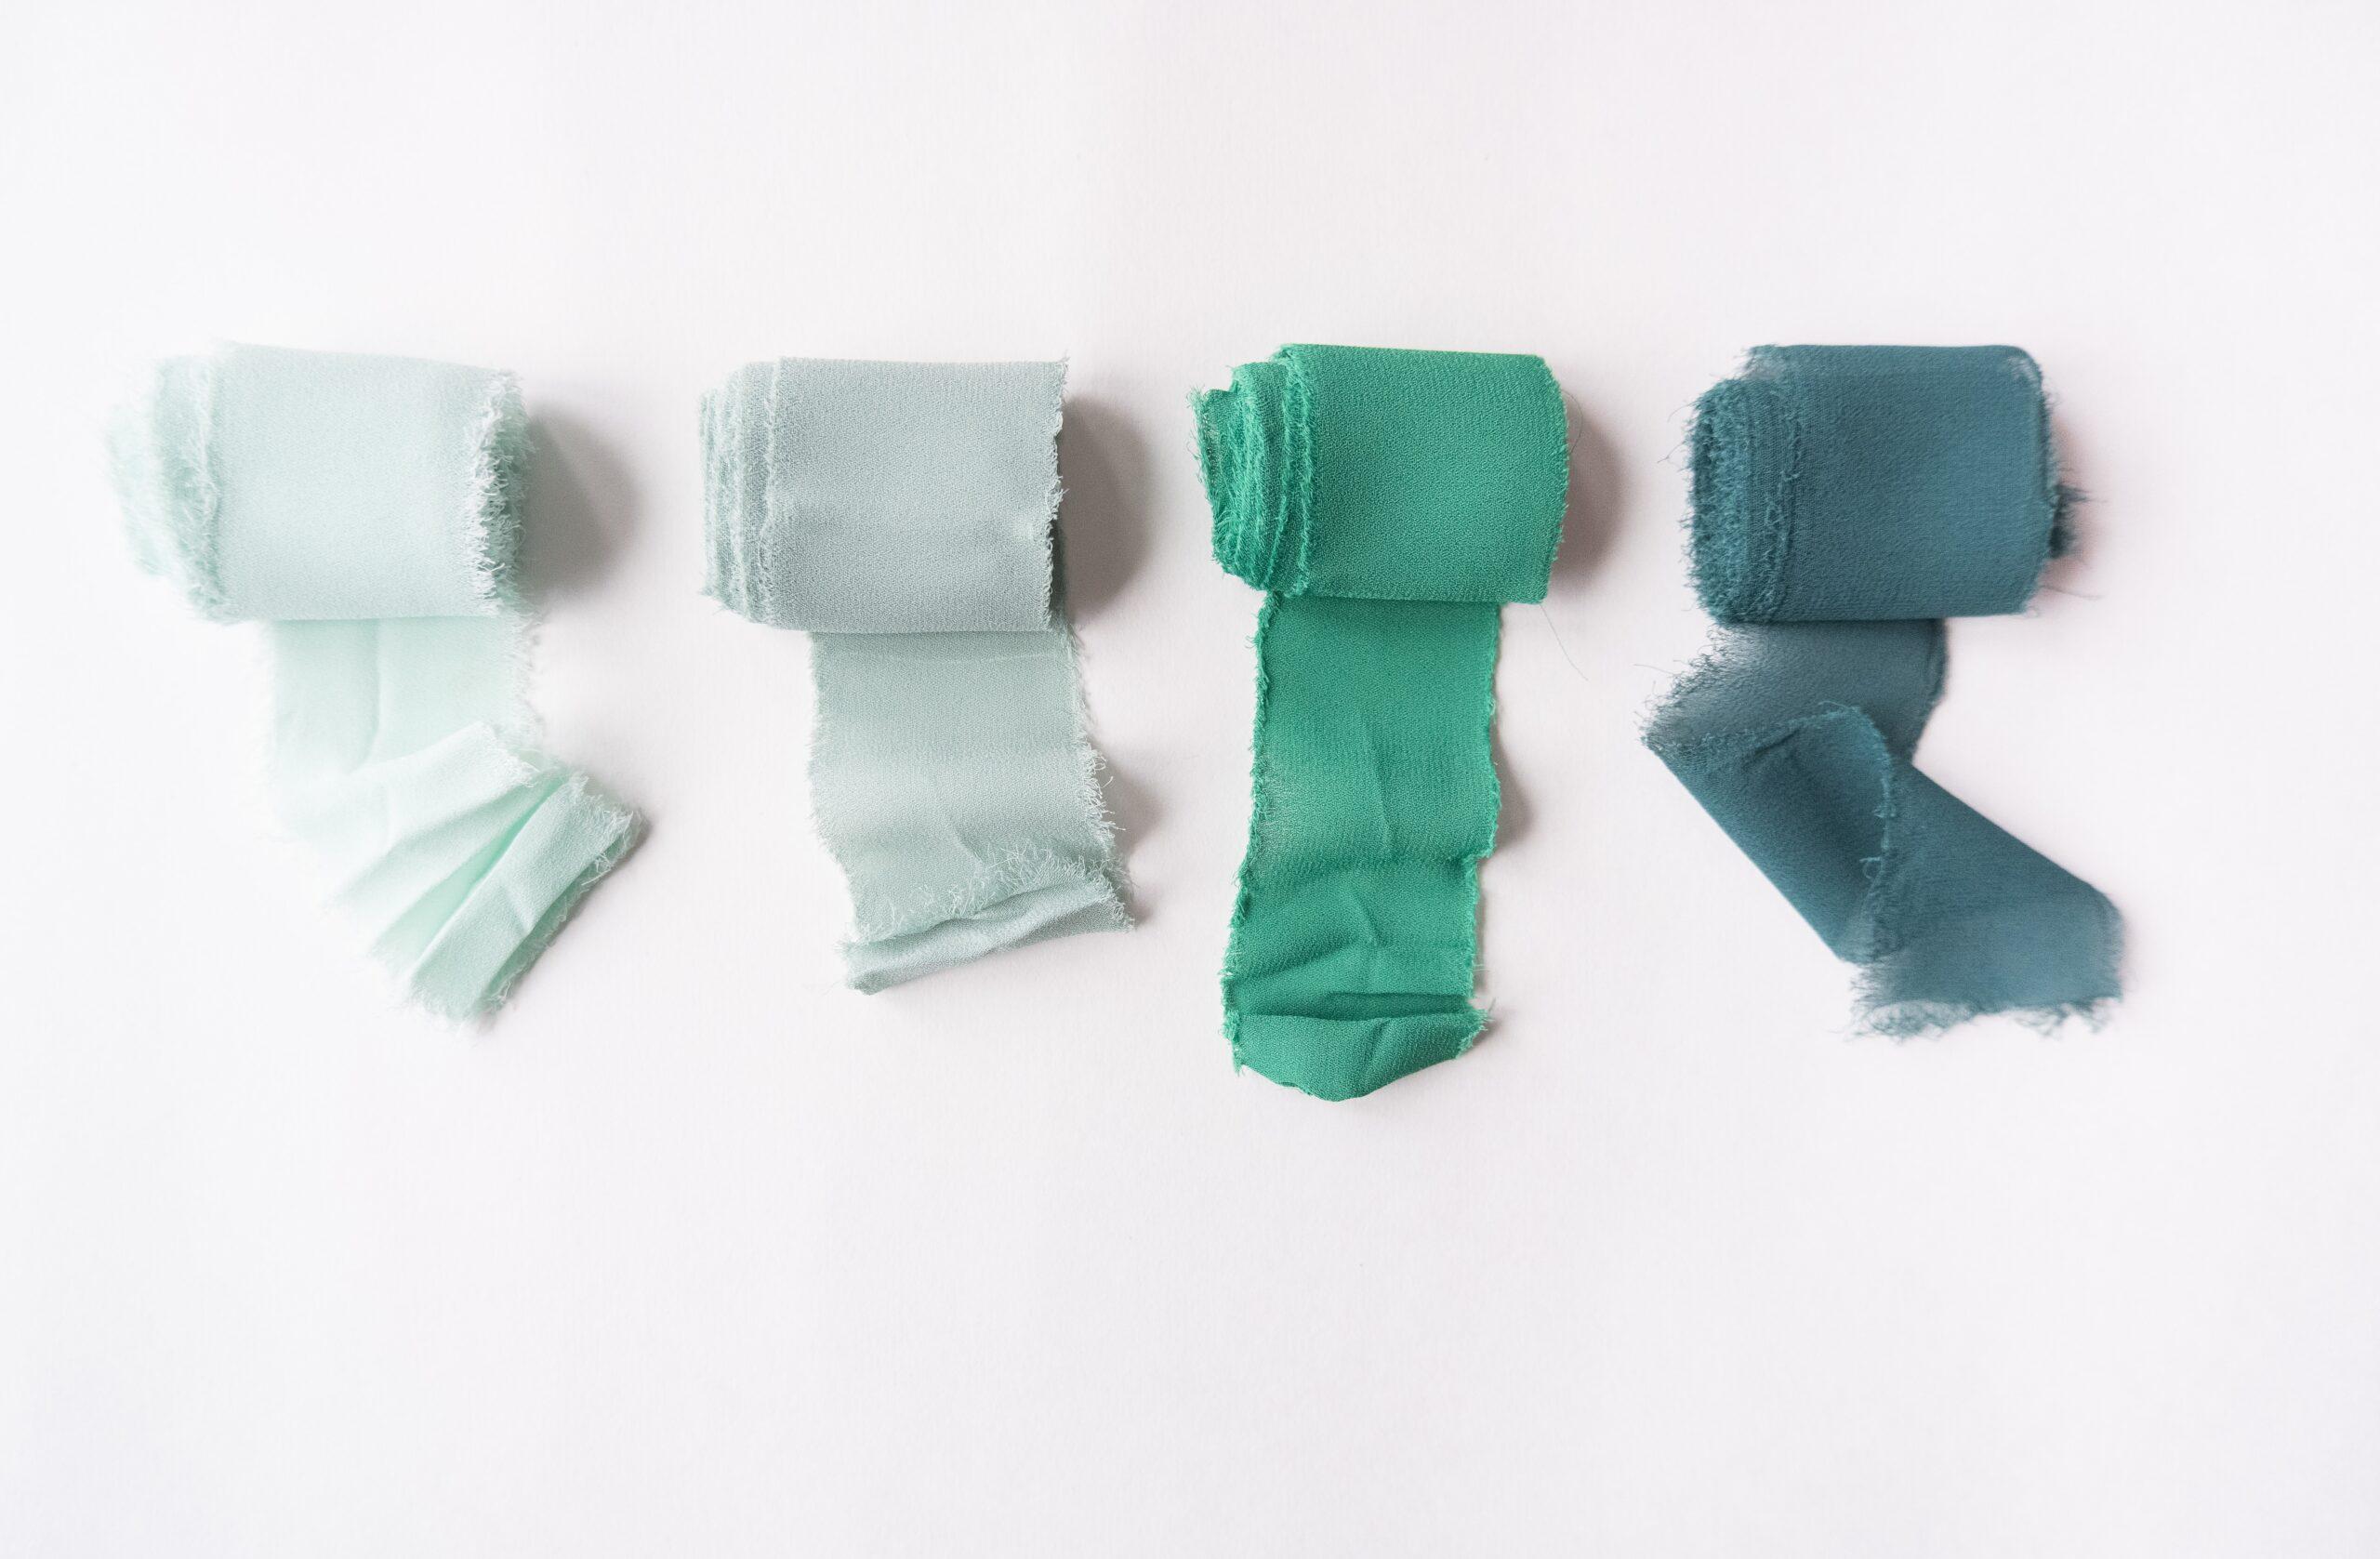 Green bandages